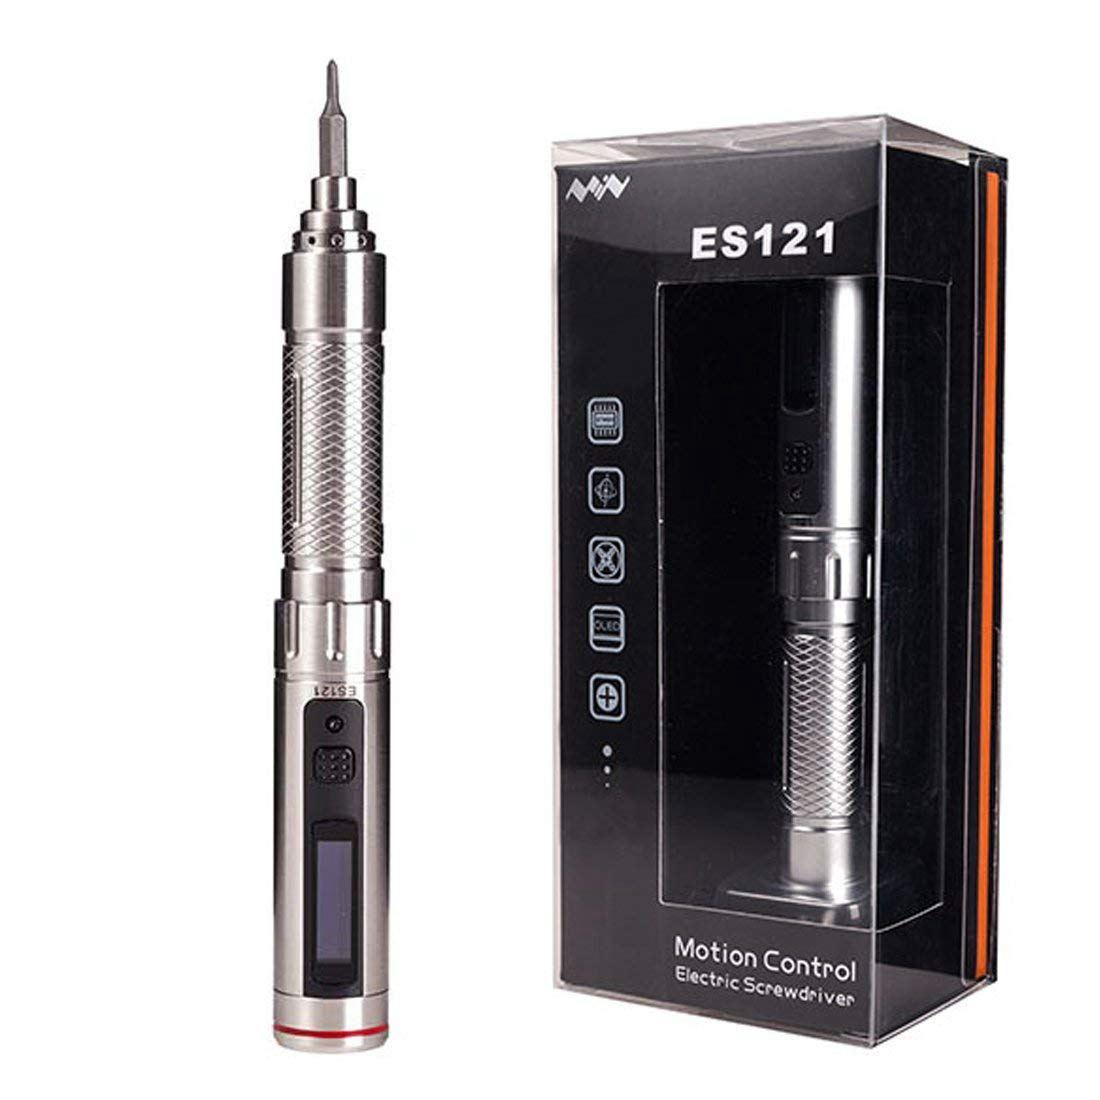 цена на CLOS Mini DC3-5V ES121 OLED Screen 16 Screw Kit STM32 Sensor Portable Power Screwdriver Rechargeable Cordless Smart screwdriver